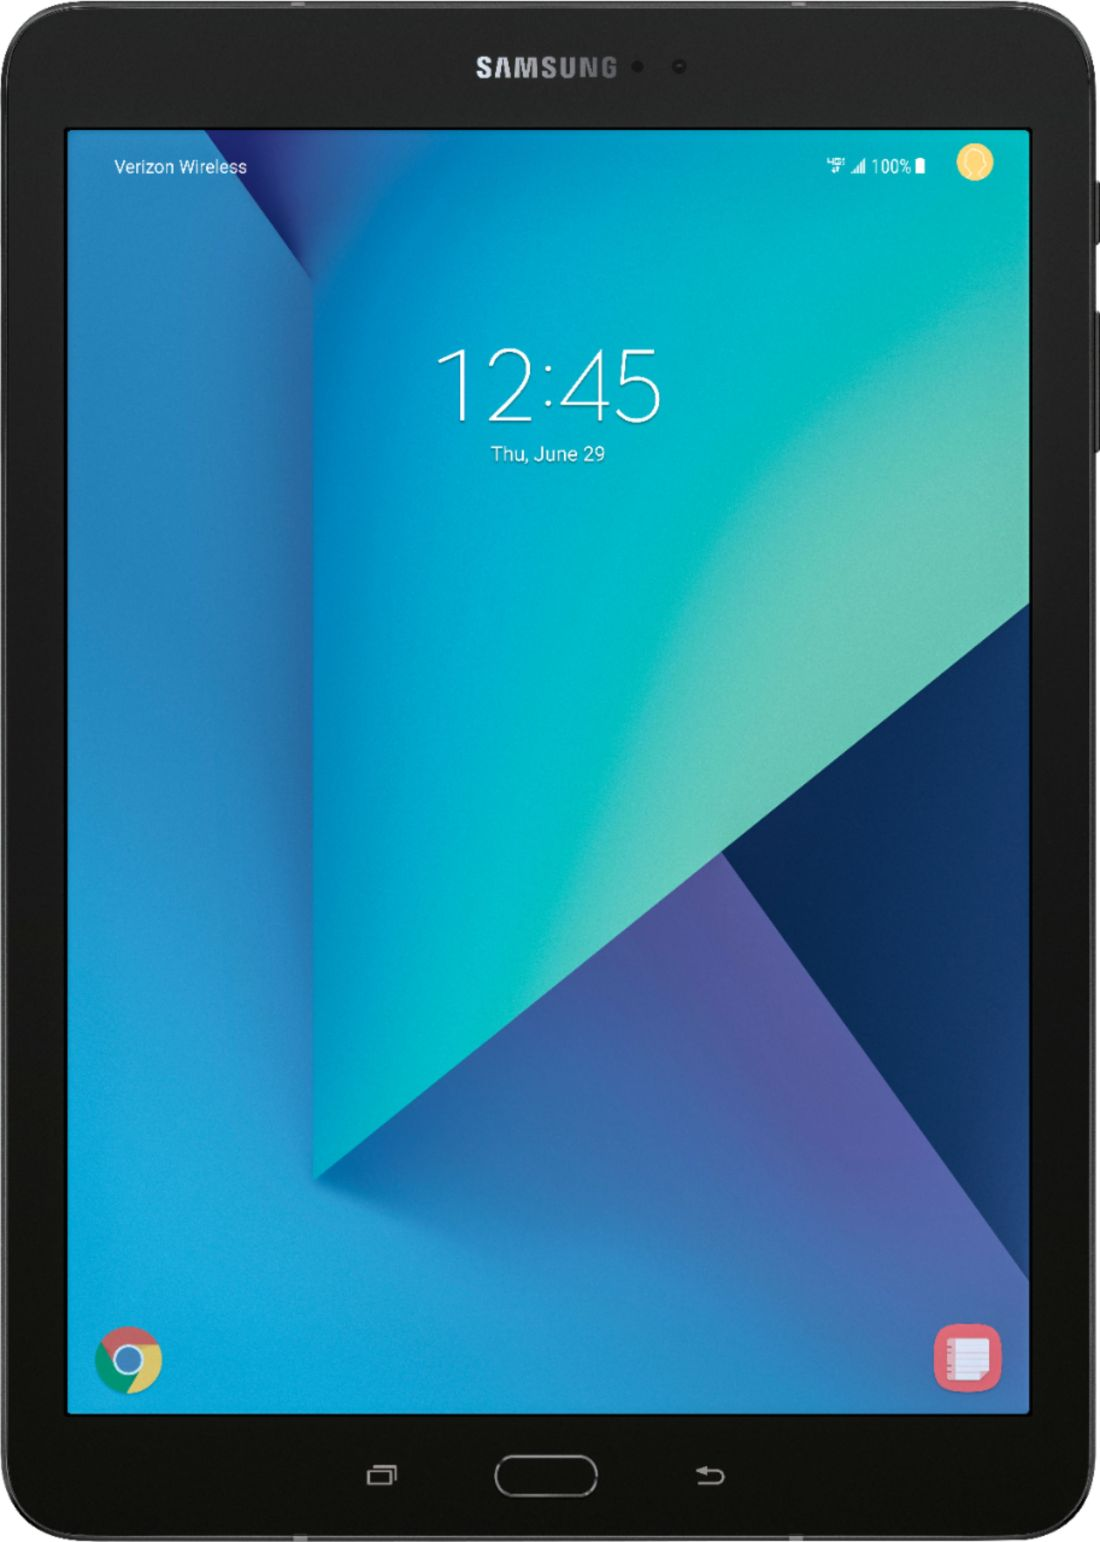 Samsung Galaxy Tab S3 Wi-Fi